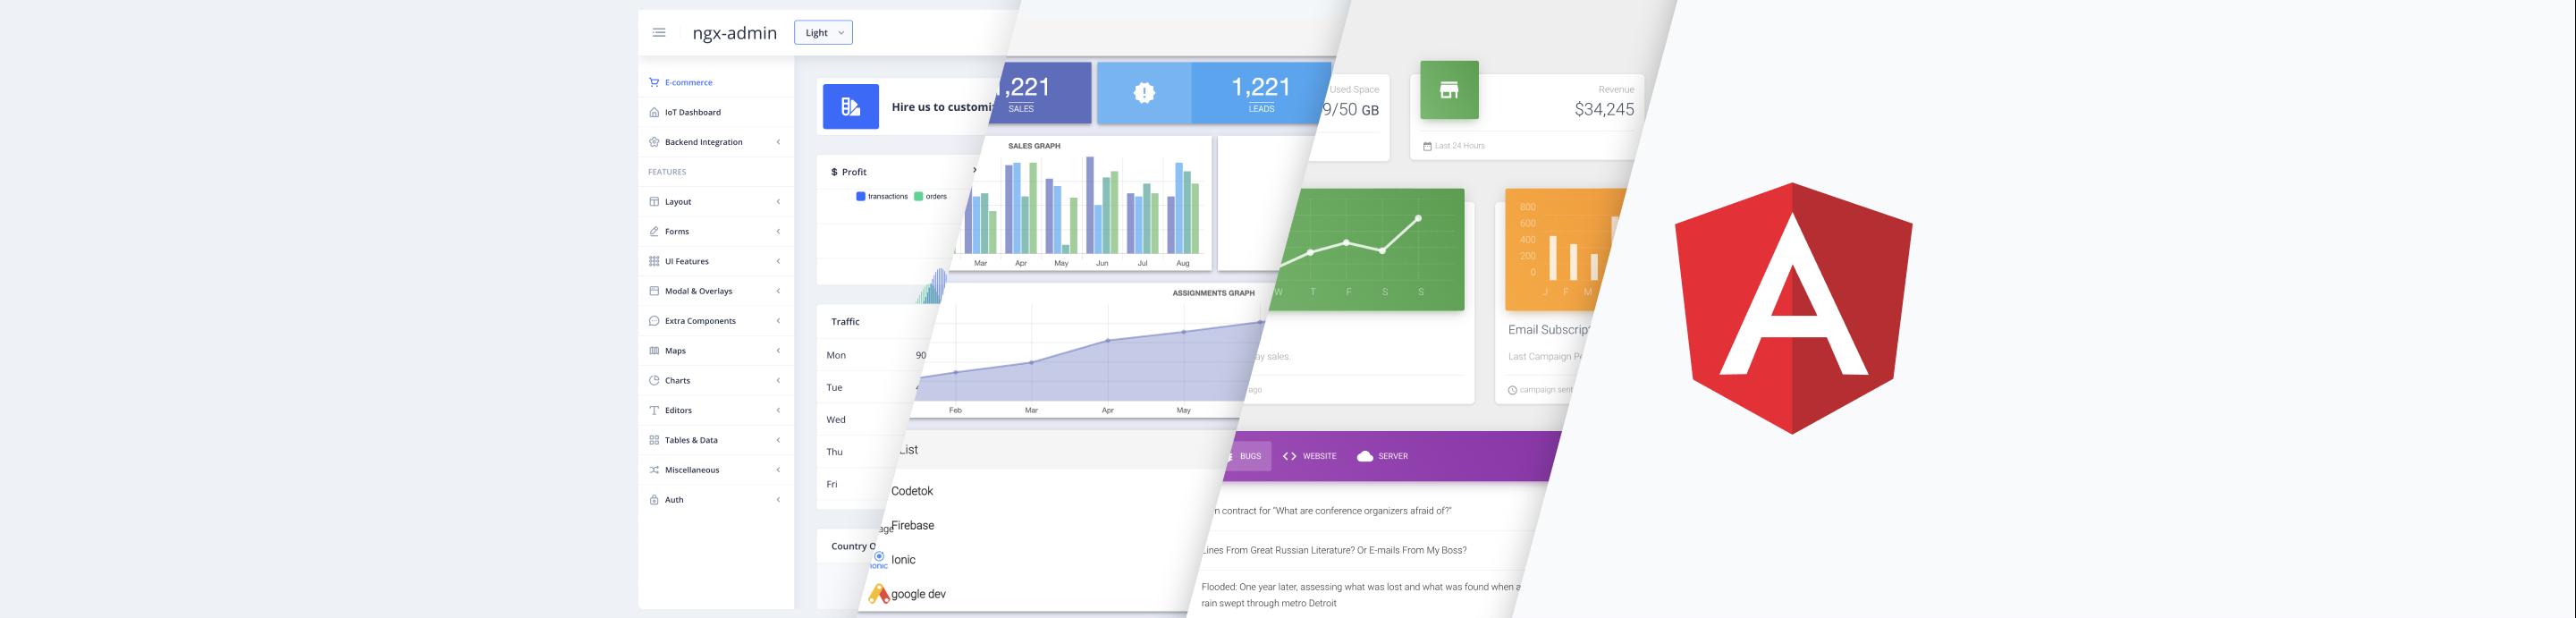 Top 19 Free Angular Admin Dashboard Templates in 2021